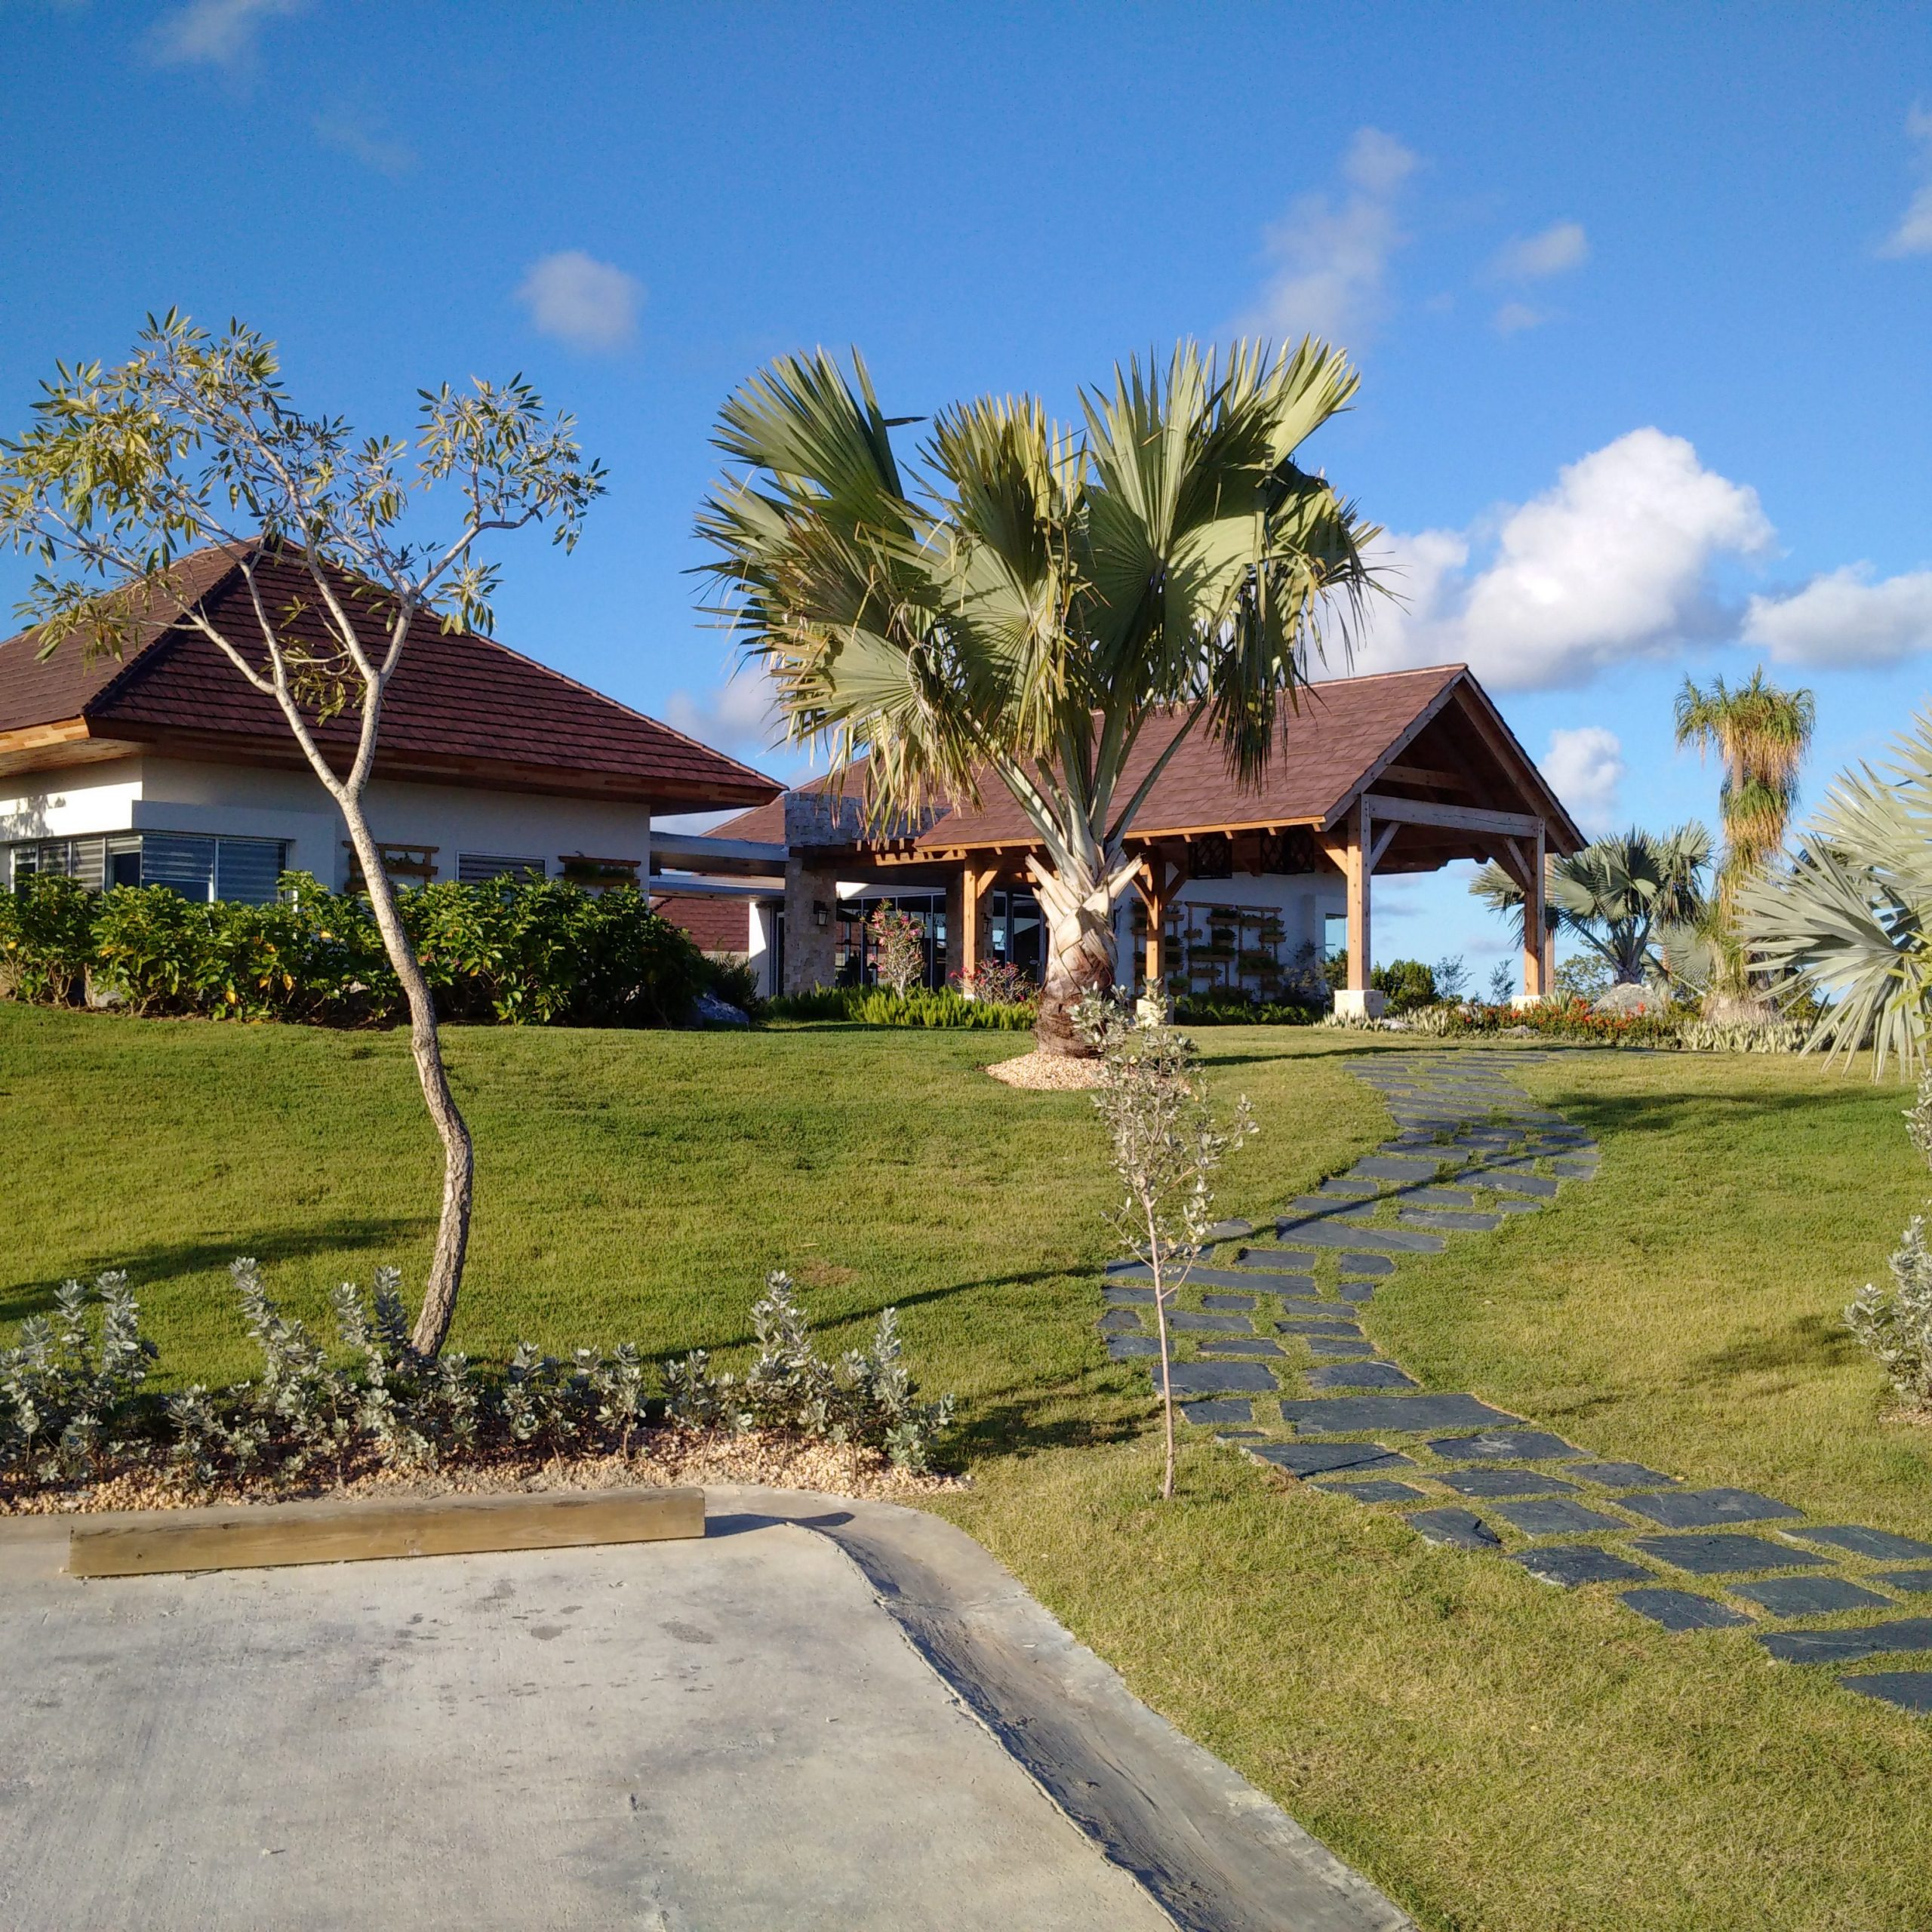 Normerica Timber Frames, Commerical Project, Dominican Republic, Los Establos, Casa Club, Resort